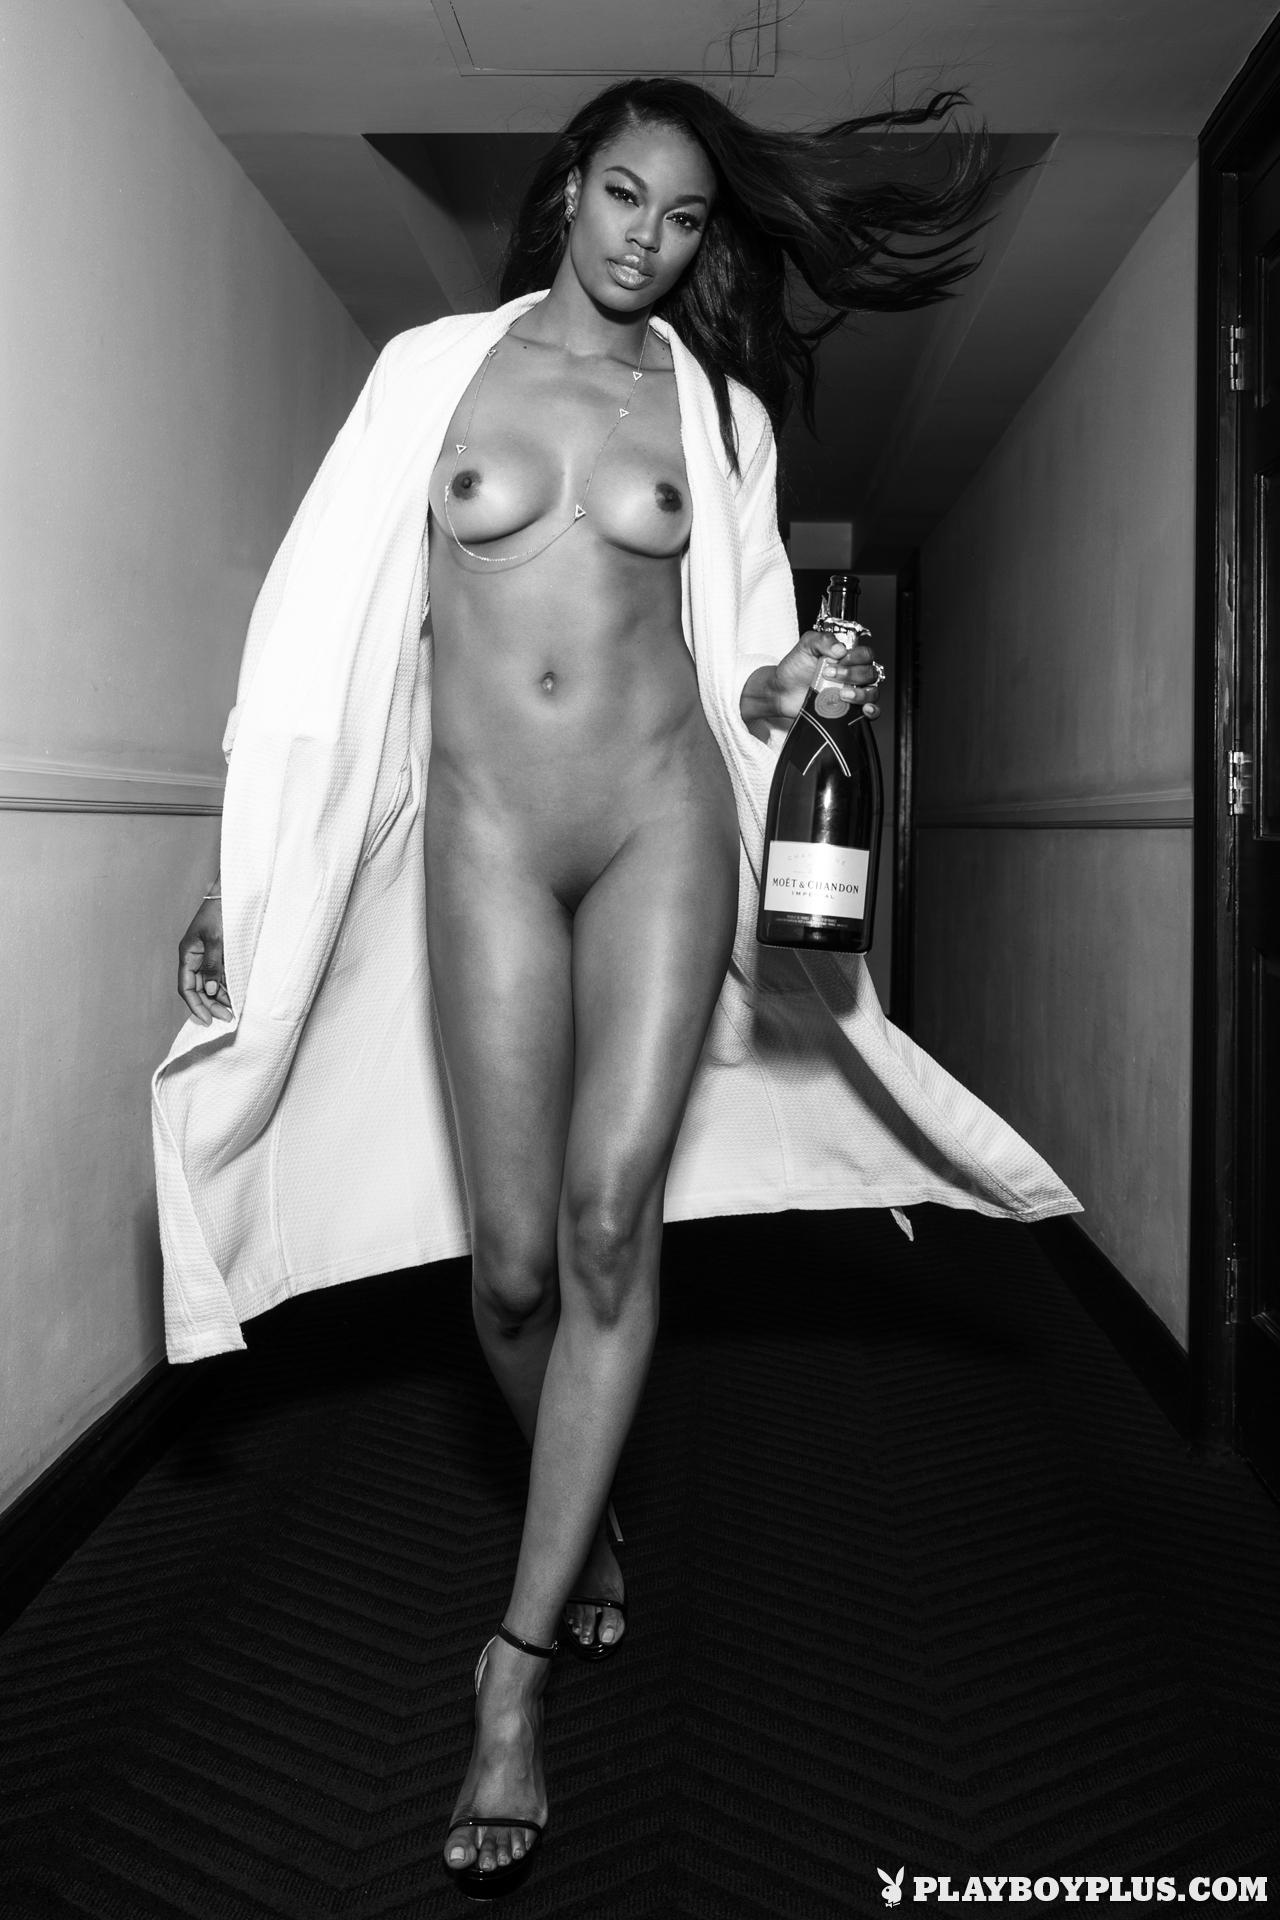 Eugena Washington In Low Key Playboy Plus Happy Birthday Eugena! (13)